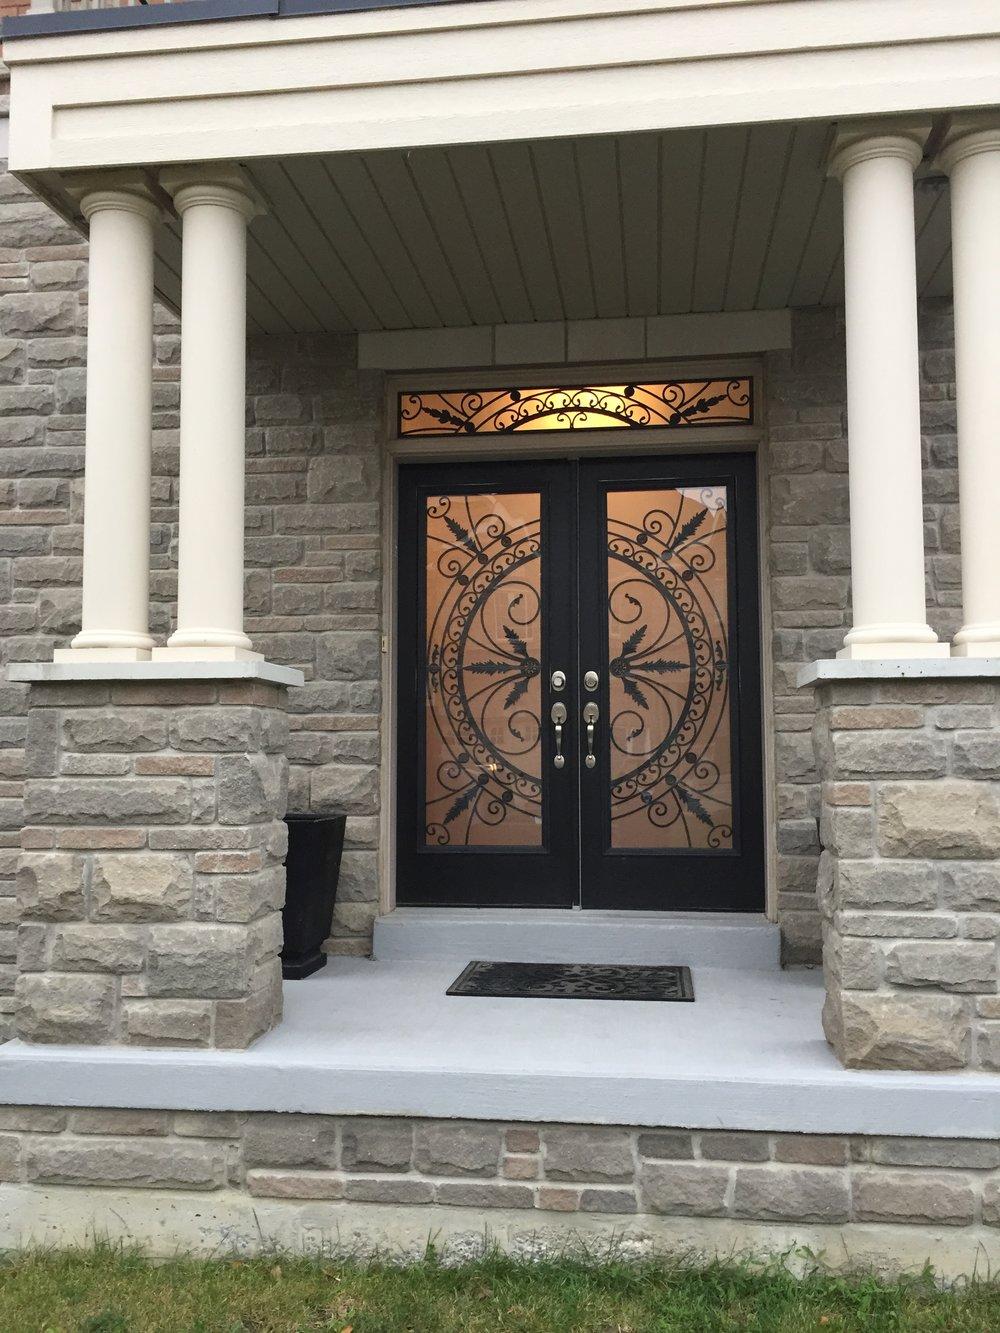 Chesterfield-wrought-Iron-Glass-Door-Inserts-Barrie-Ontario